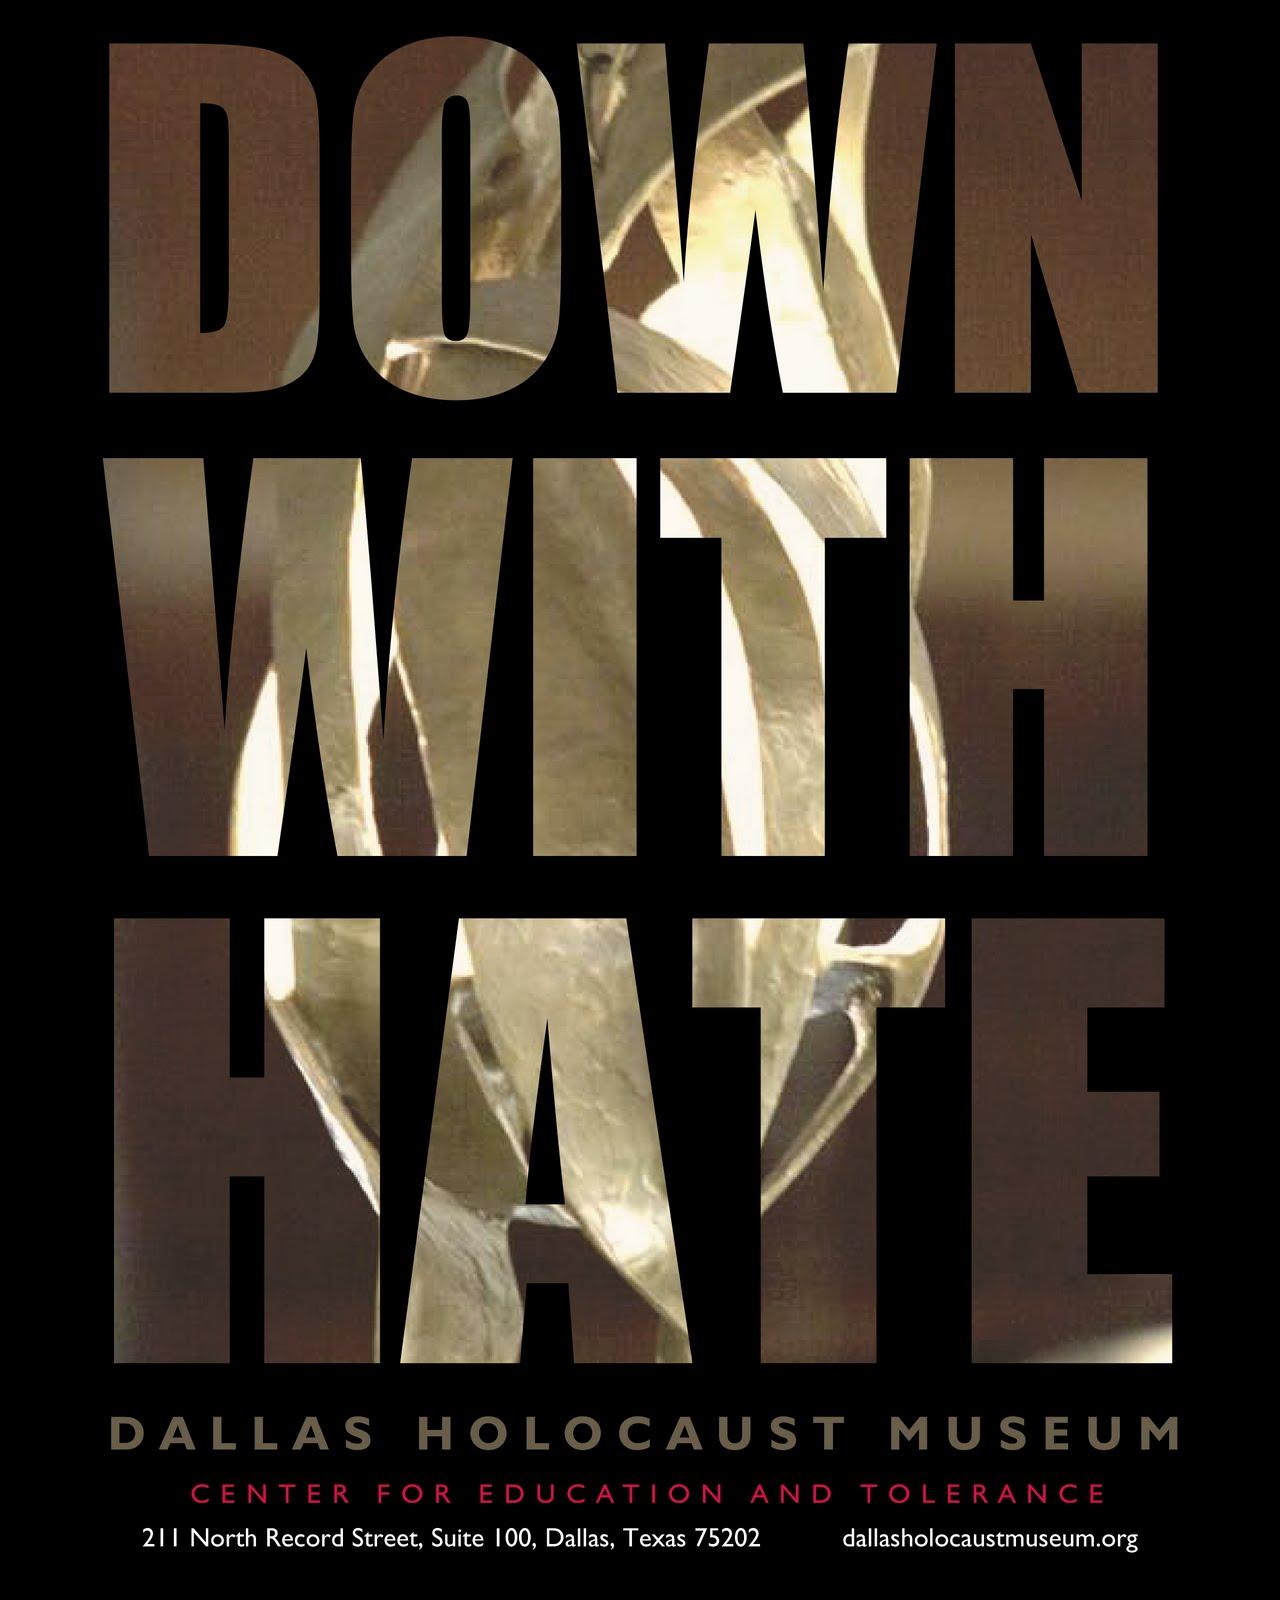 Ruth Siddiqi Graphic Design Dallas Holocaust Museum Poster